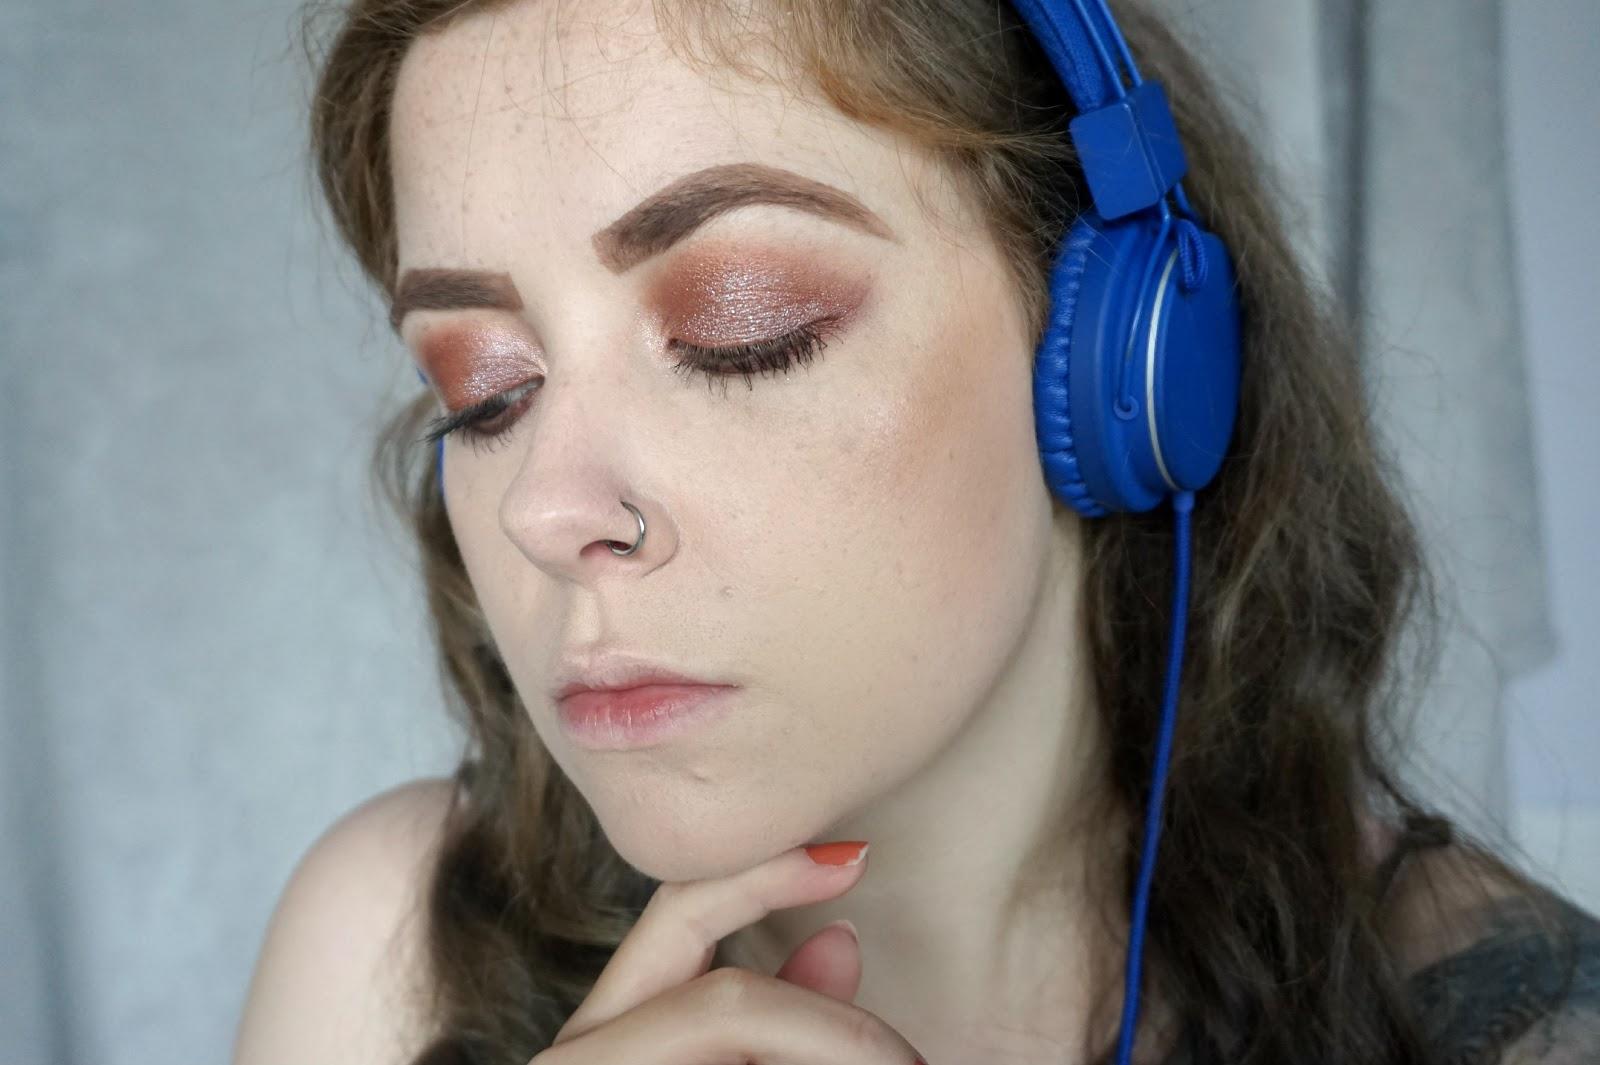 girl make-up headphones earphones music listening